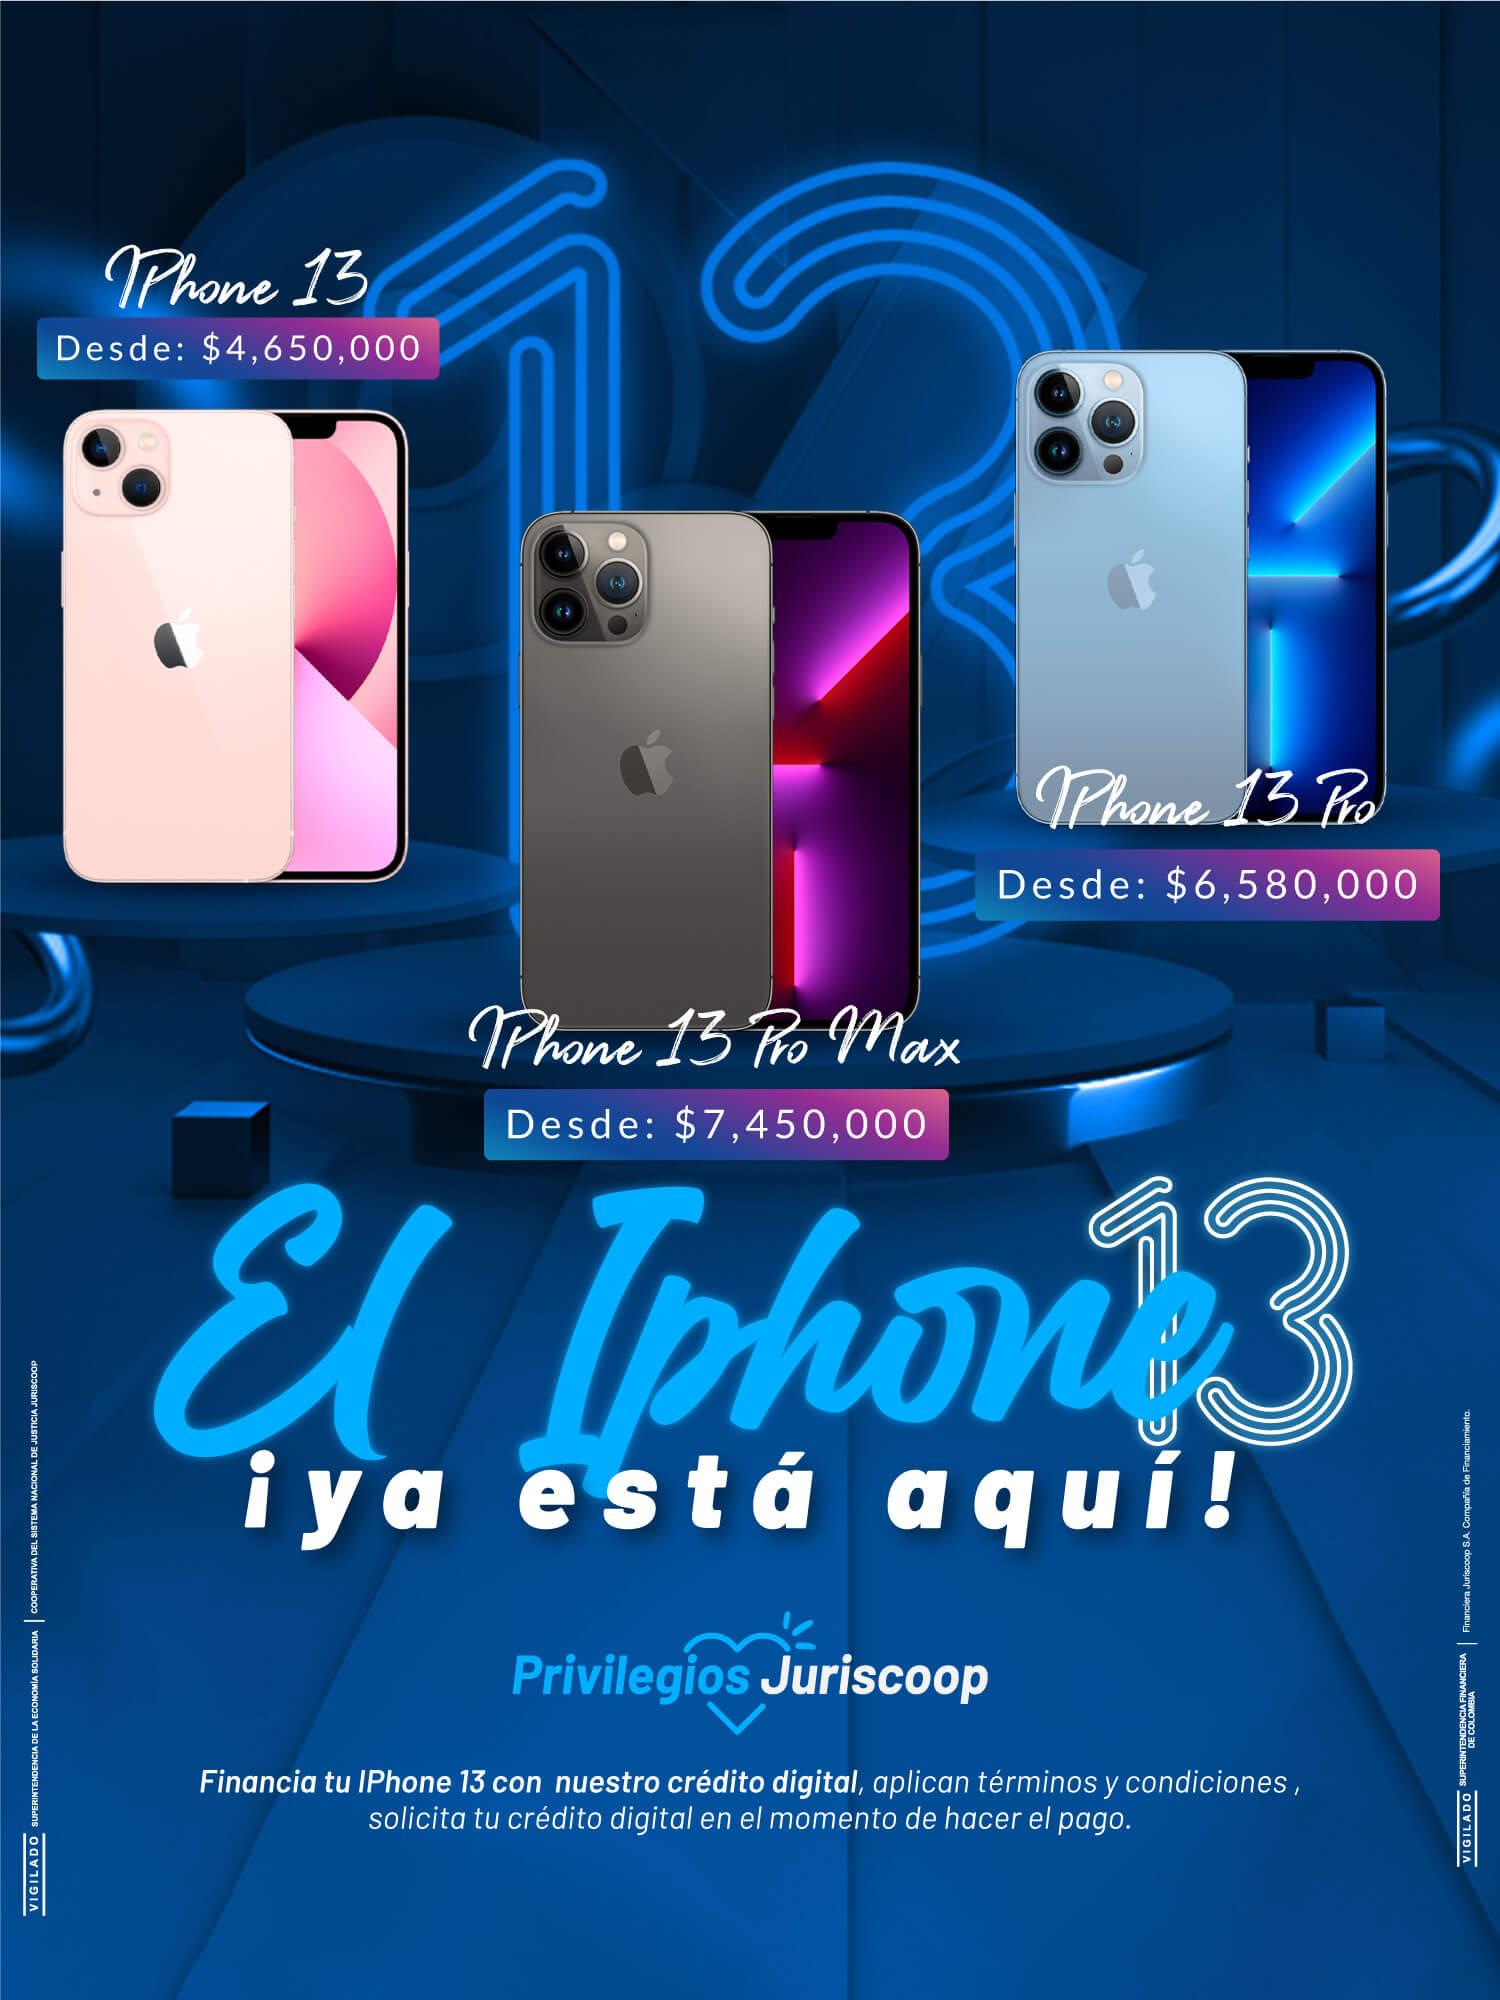 iPhone 13 Financia tu equipo